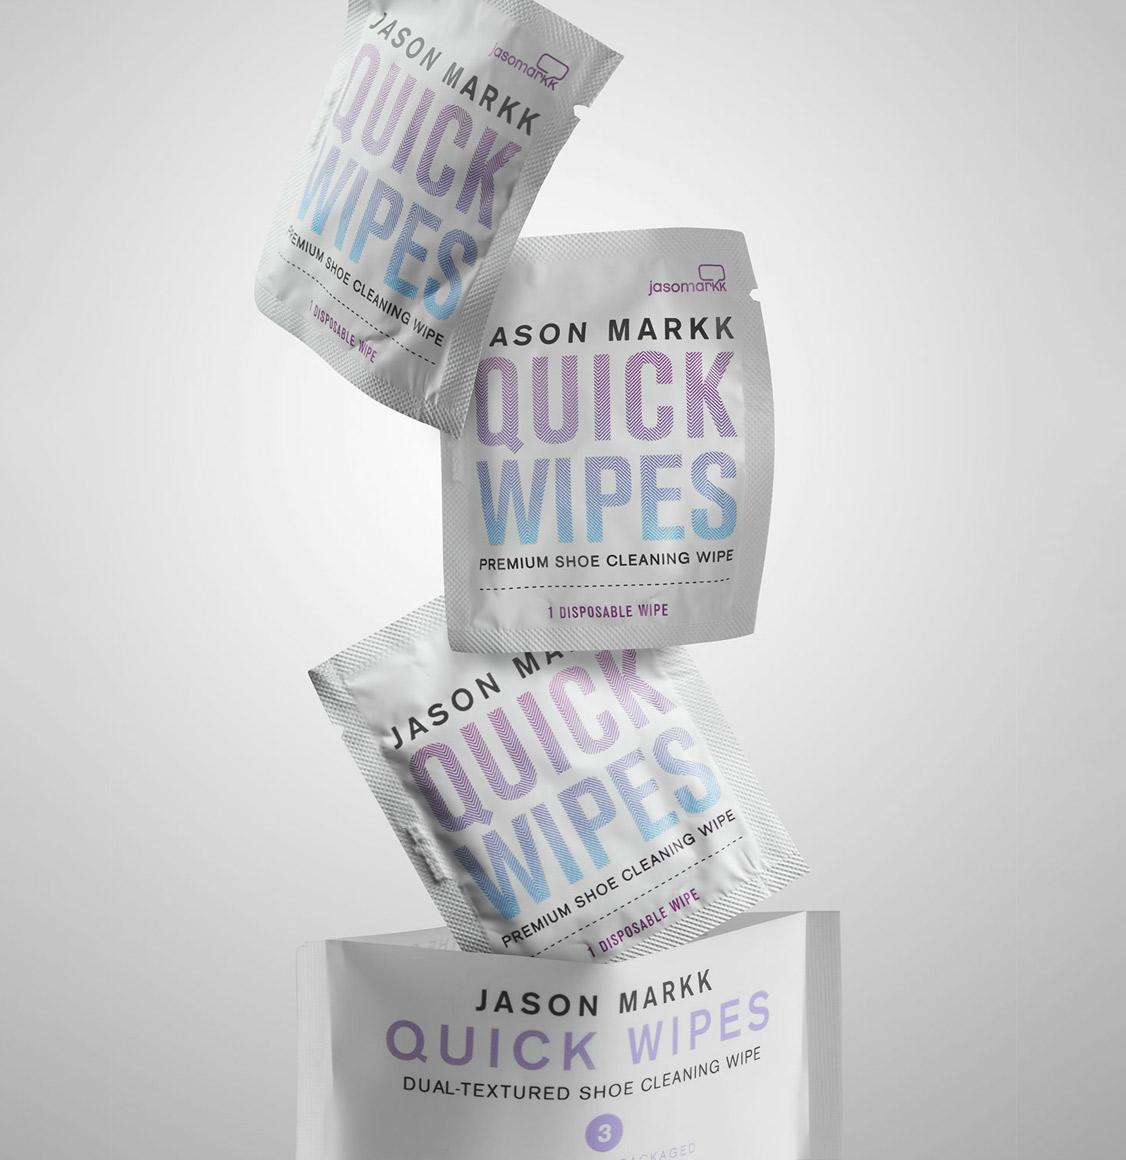 Jason Markk Pack of 3 Quick Wipes